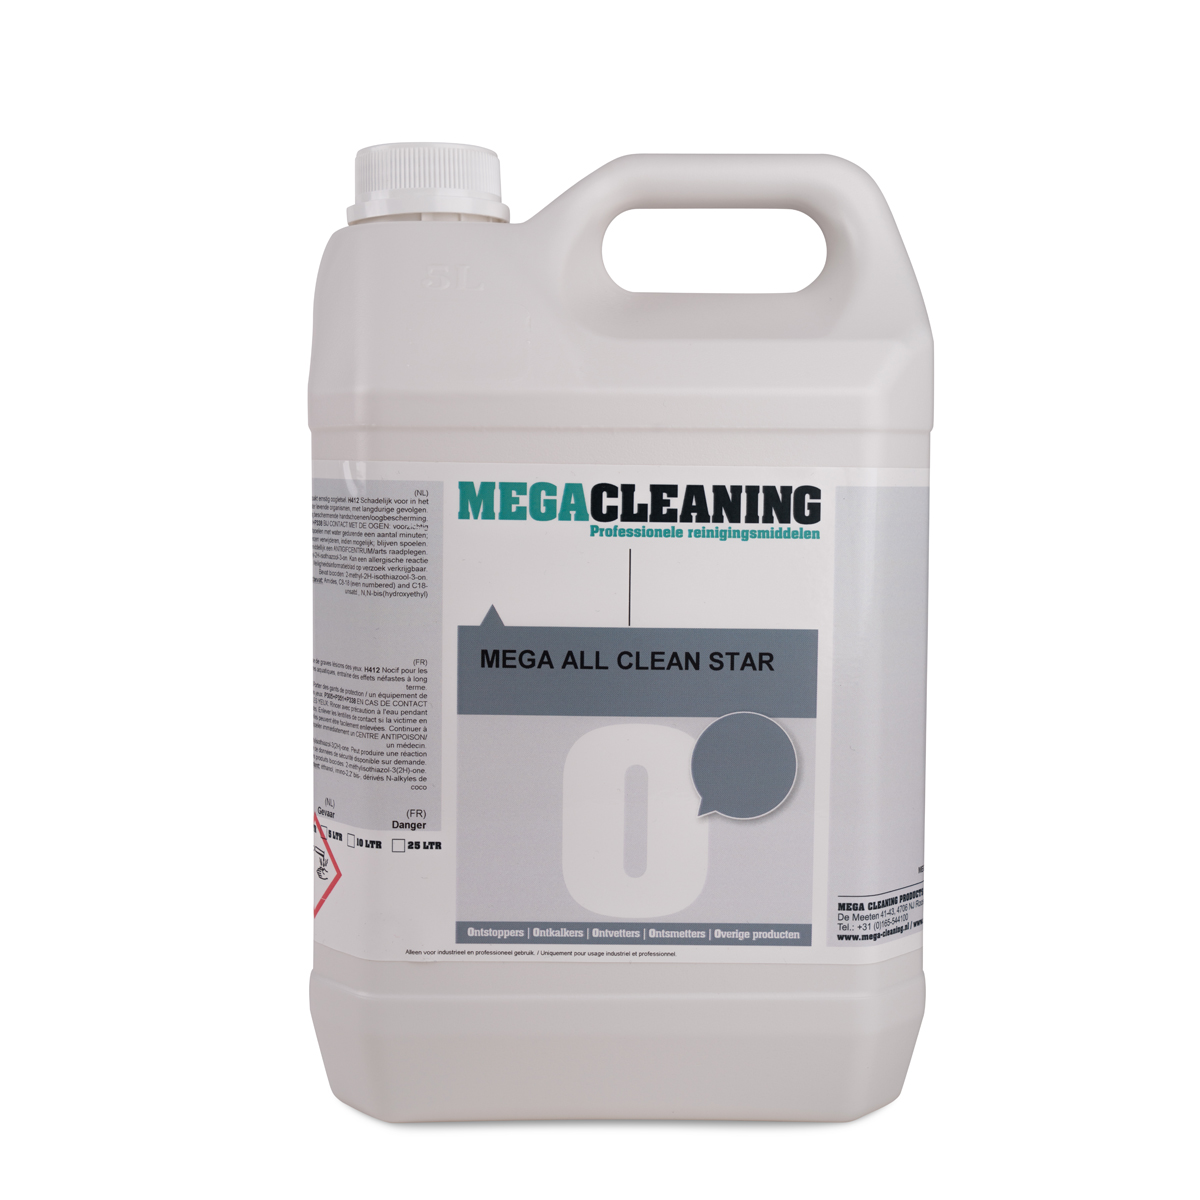 MEGA All Clean Star, allesreiniger